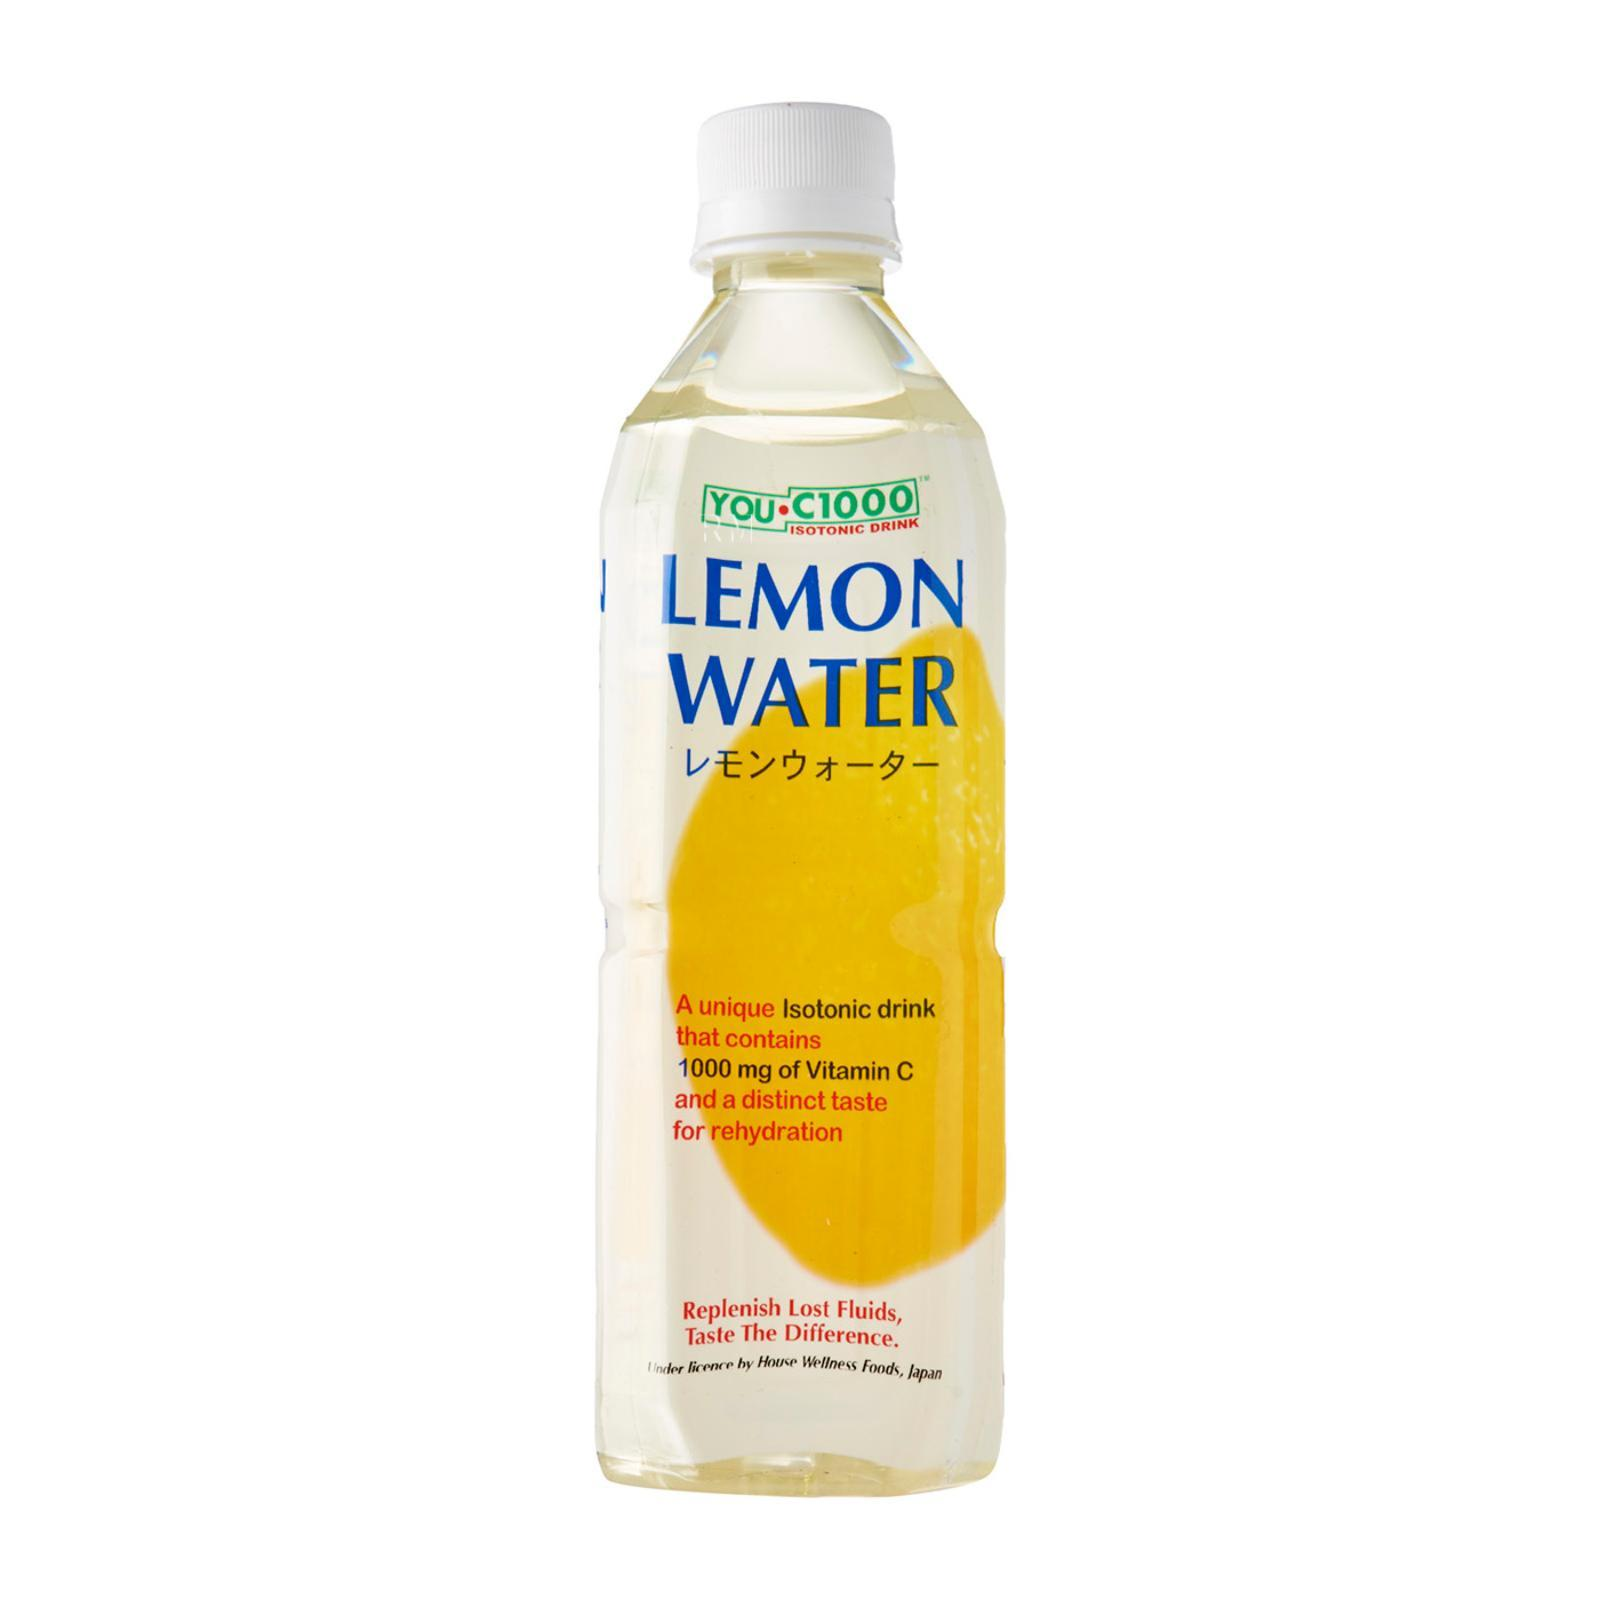 YOUC1000 Lemon Water